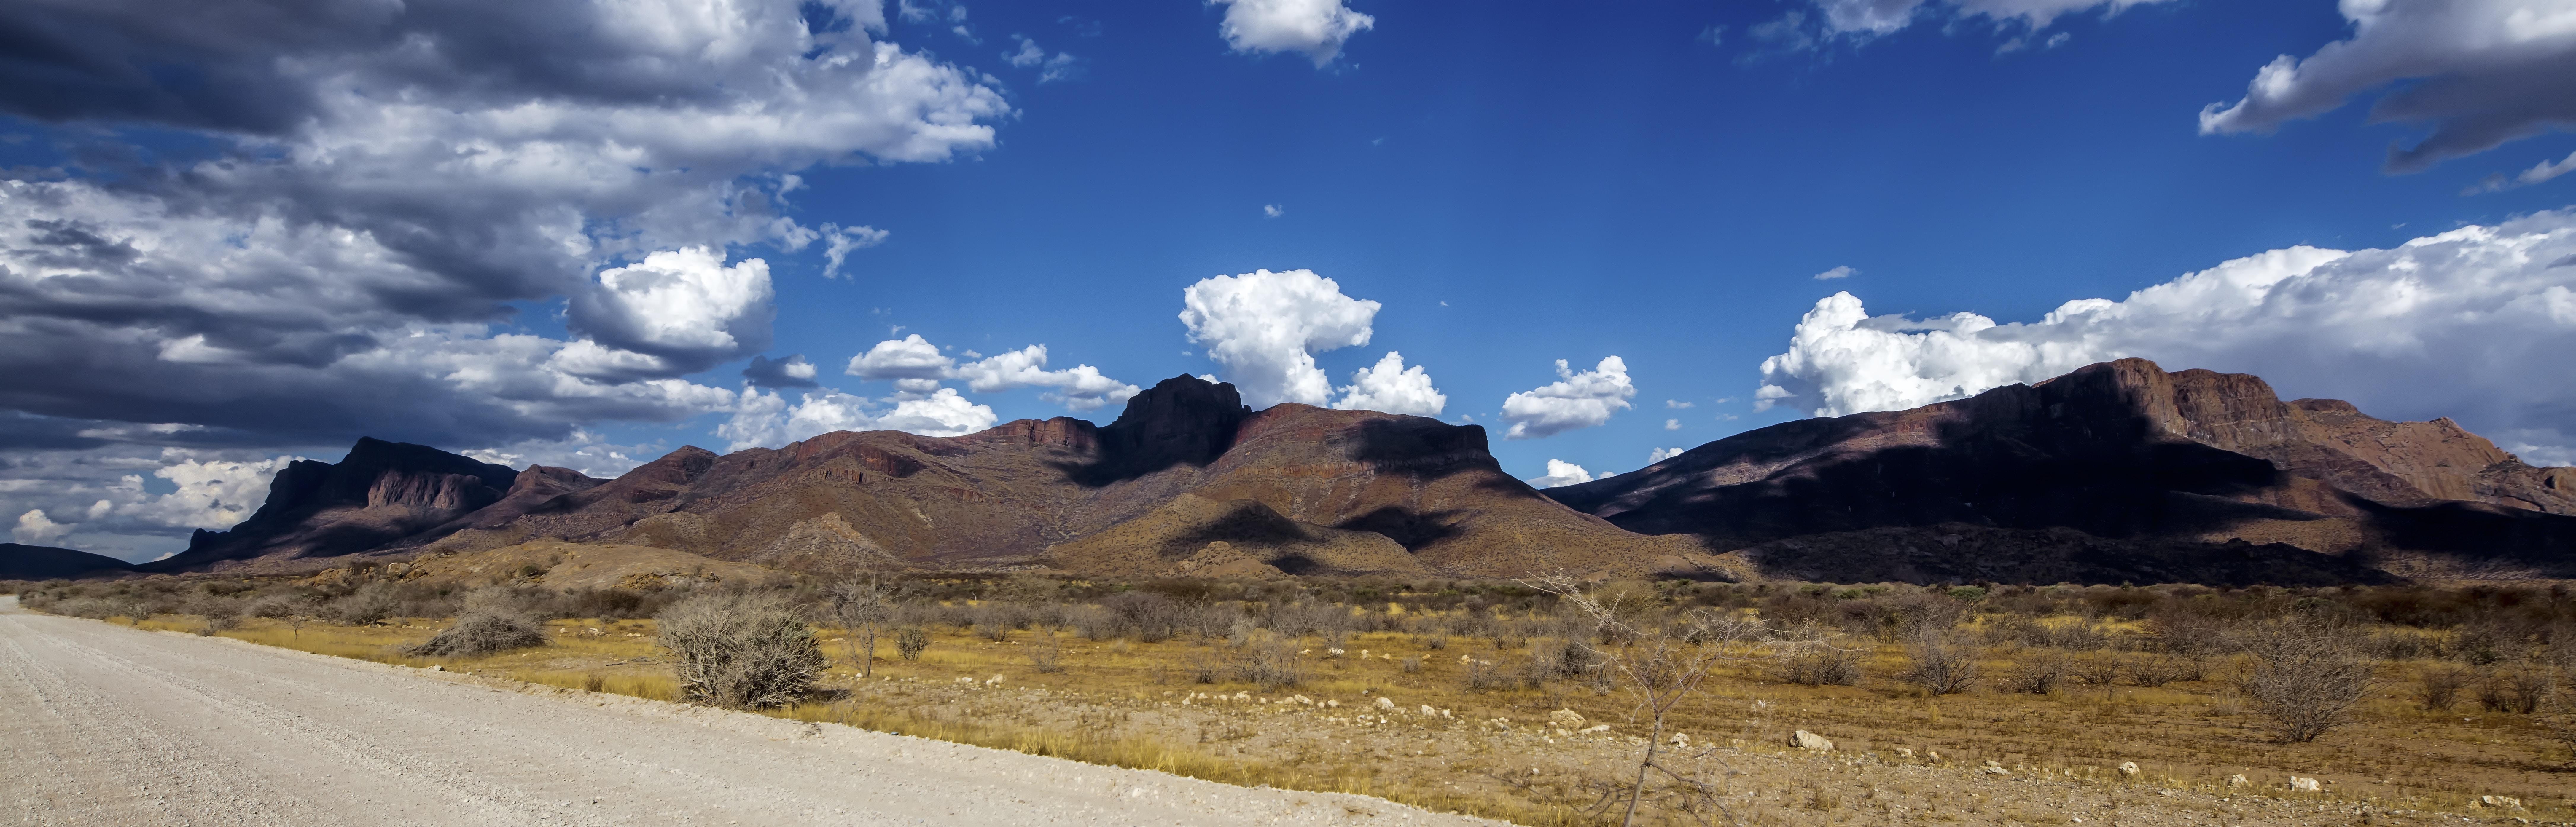 photo of roadway near hills